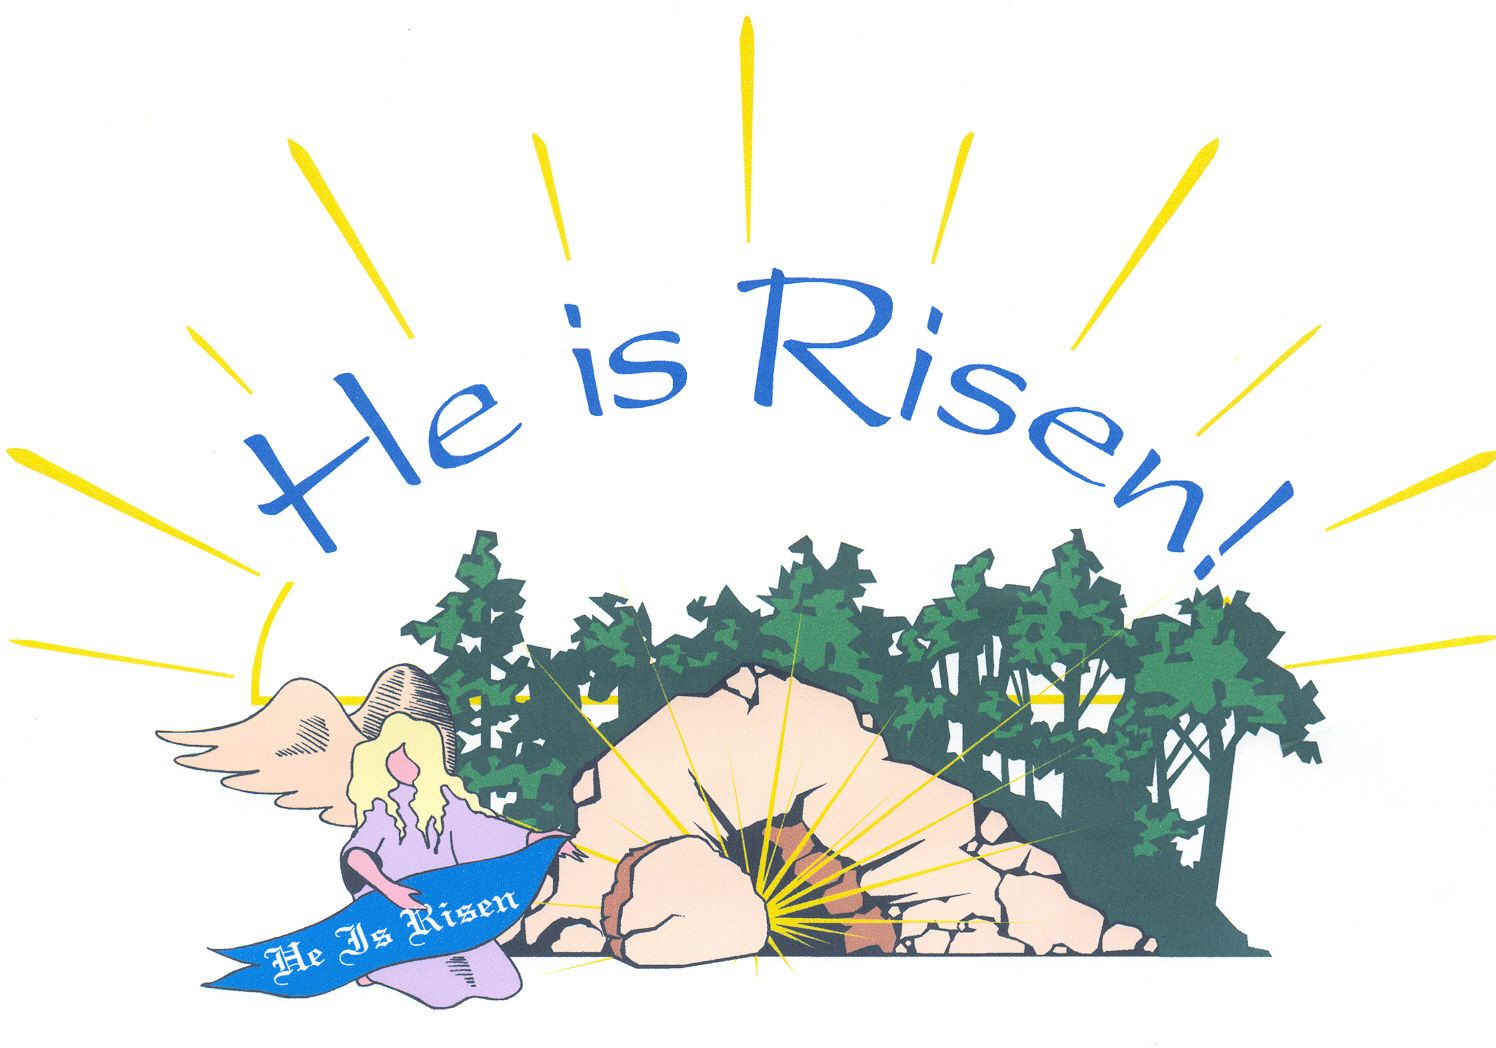 medium resolution of free christian clip art free christian wallpaper jesus is risen he is risen